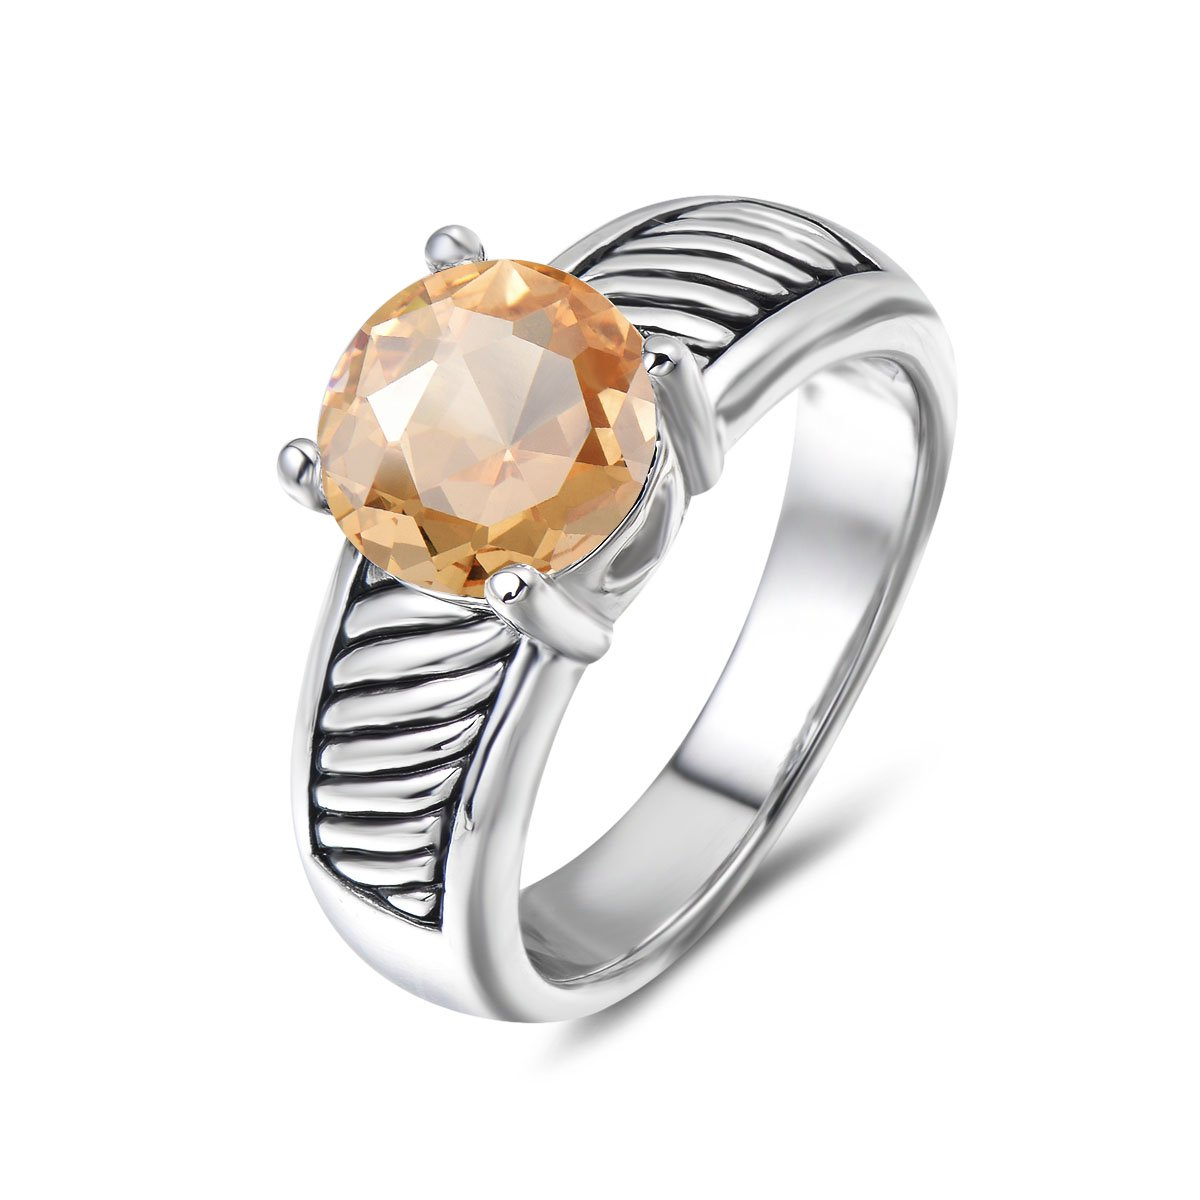 UNY Ring Vintage Antique Femme Designer Fashion Brand David Jewelry love Wedding Christmas Valentine Gift (7, champagne-zirconia)